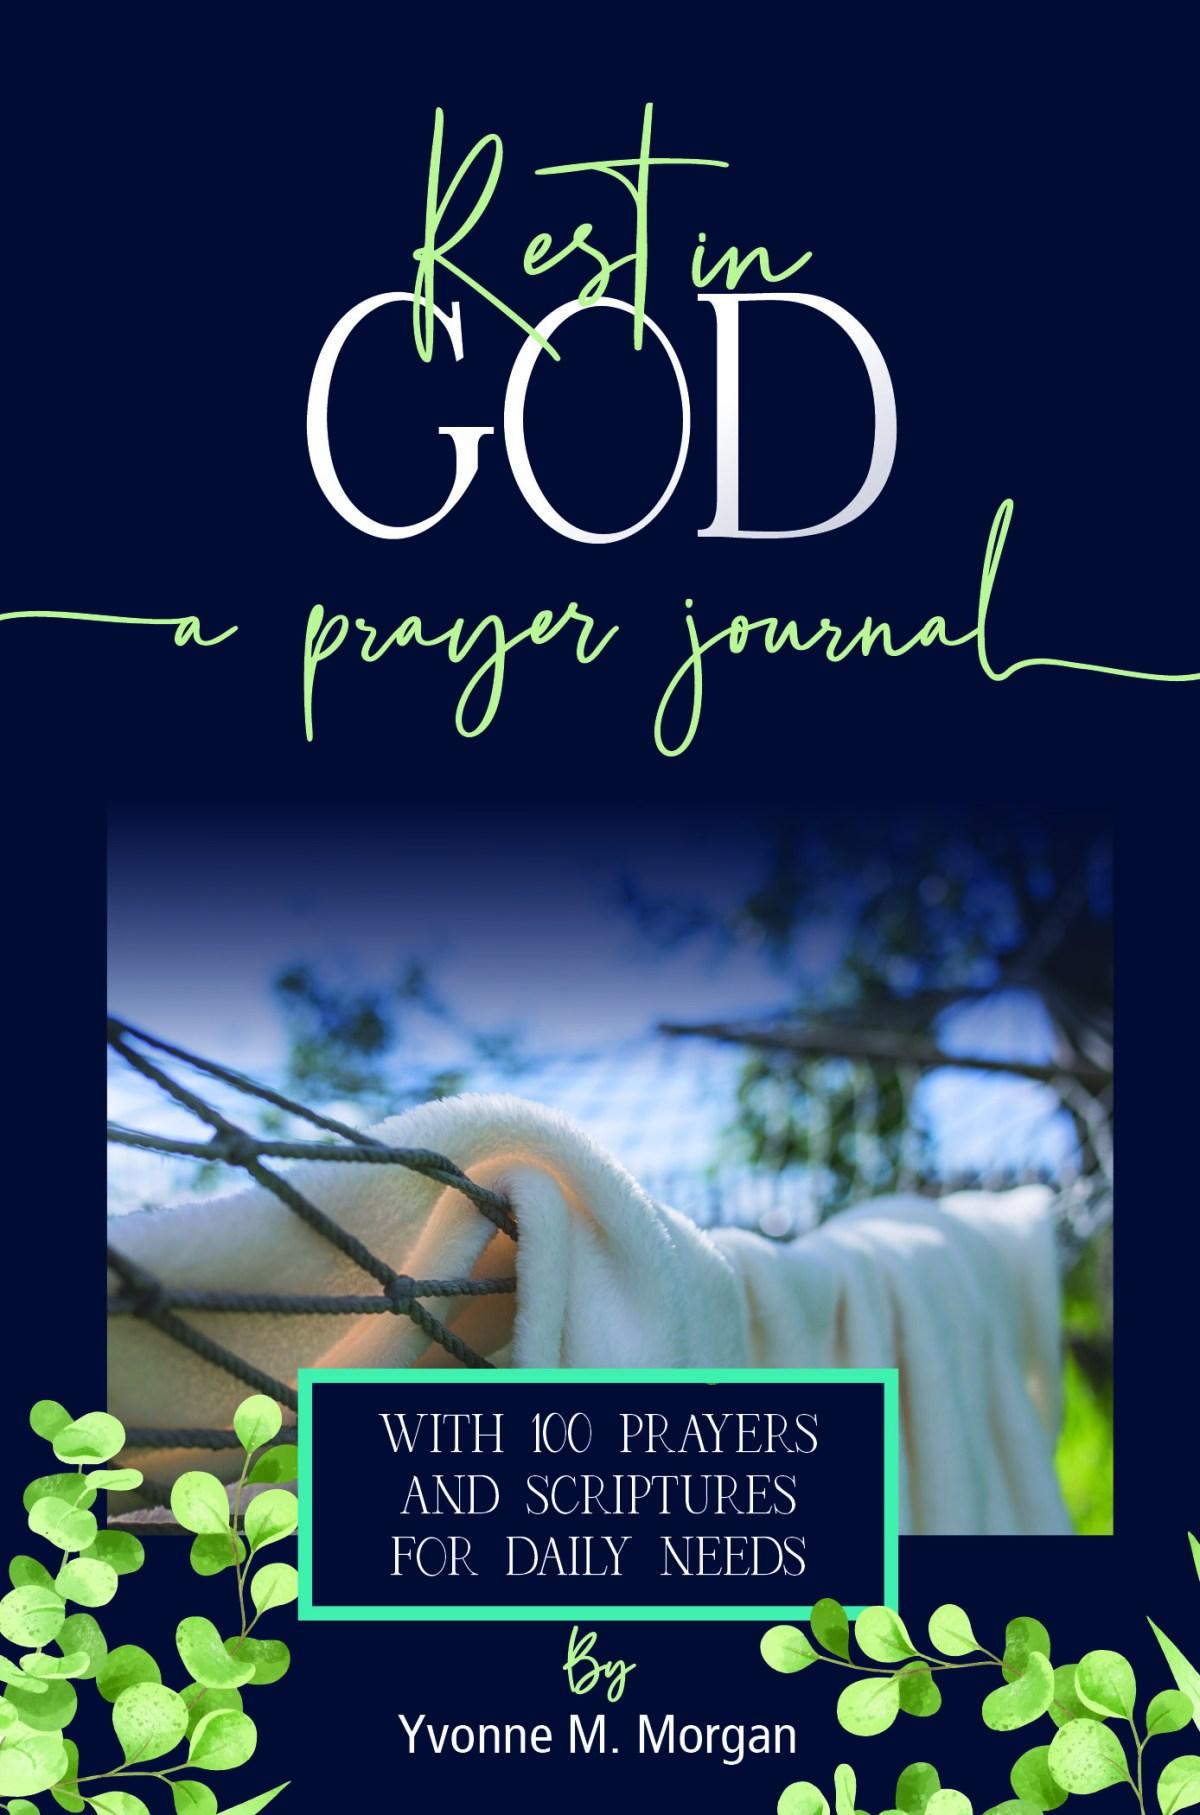 Rest in God: A Prayer Journal